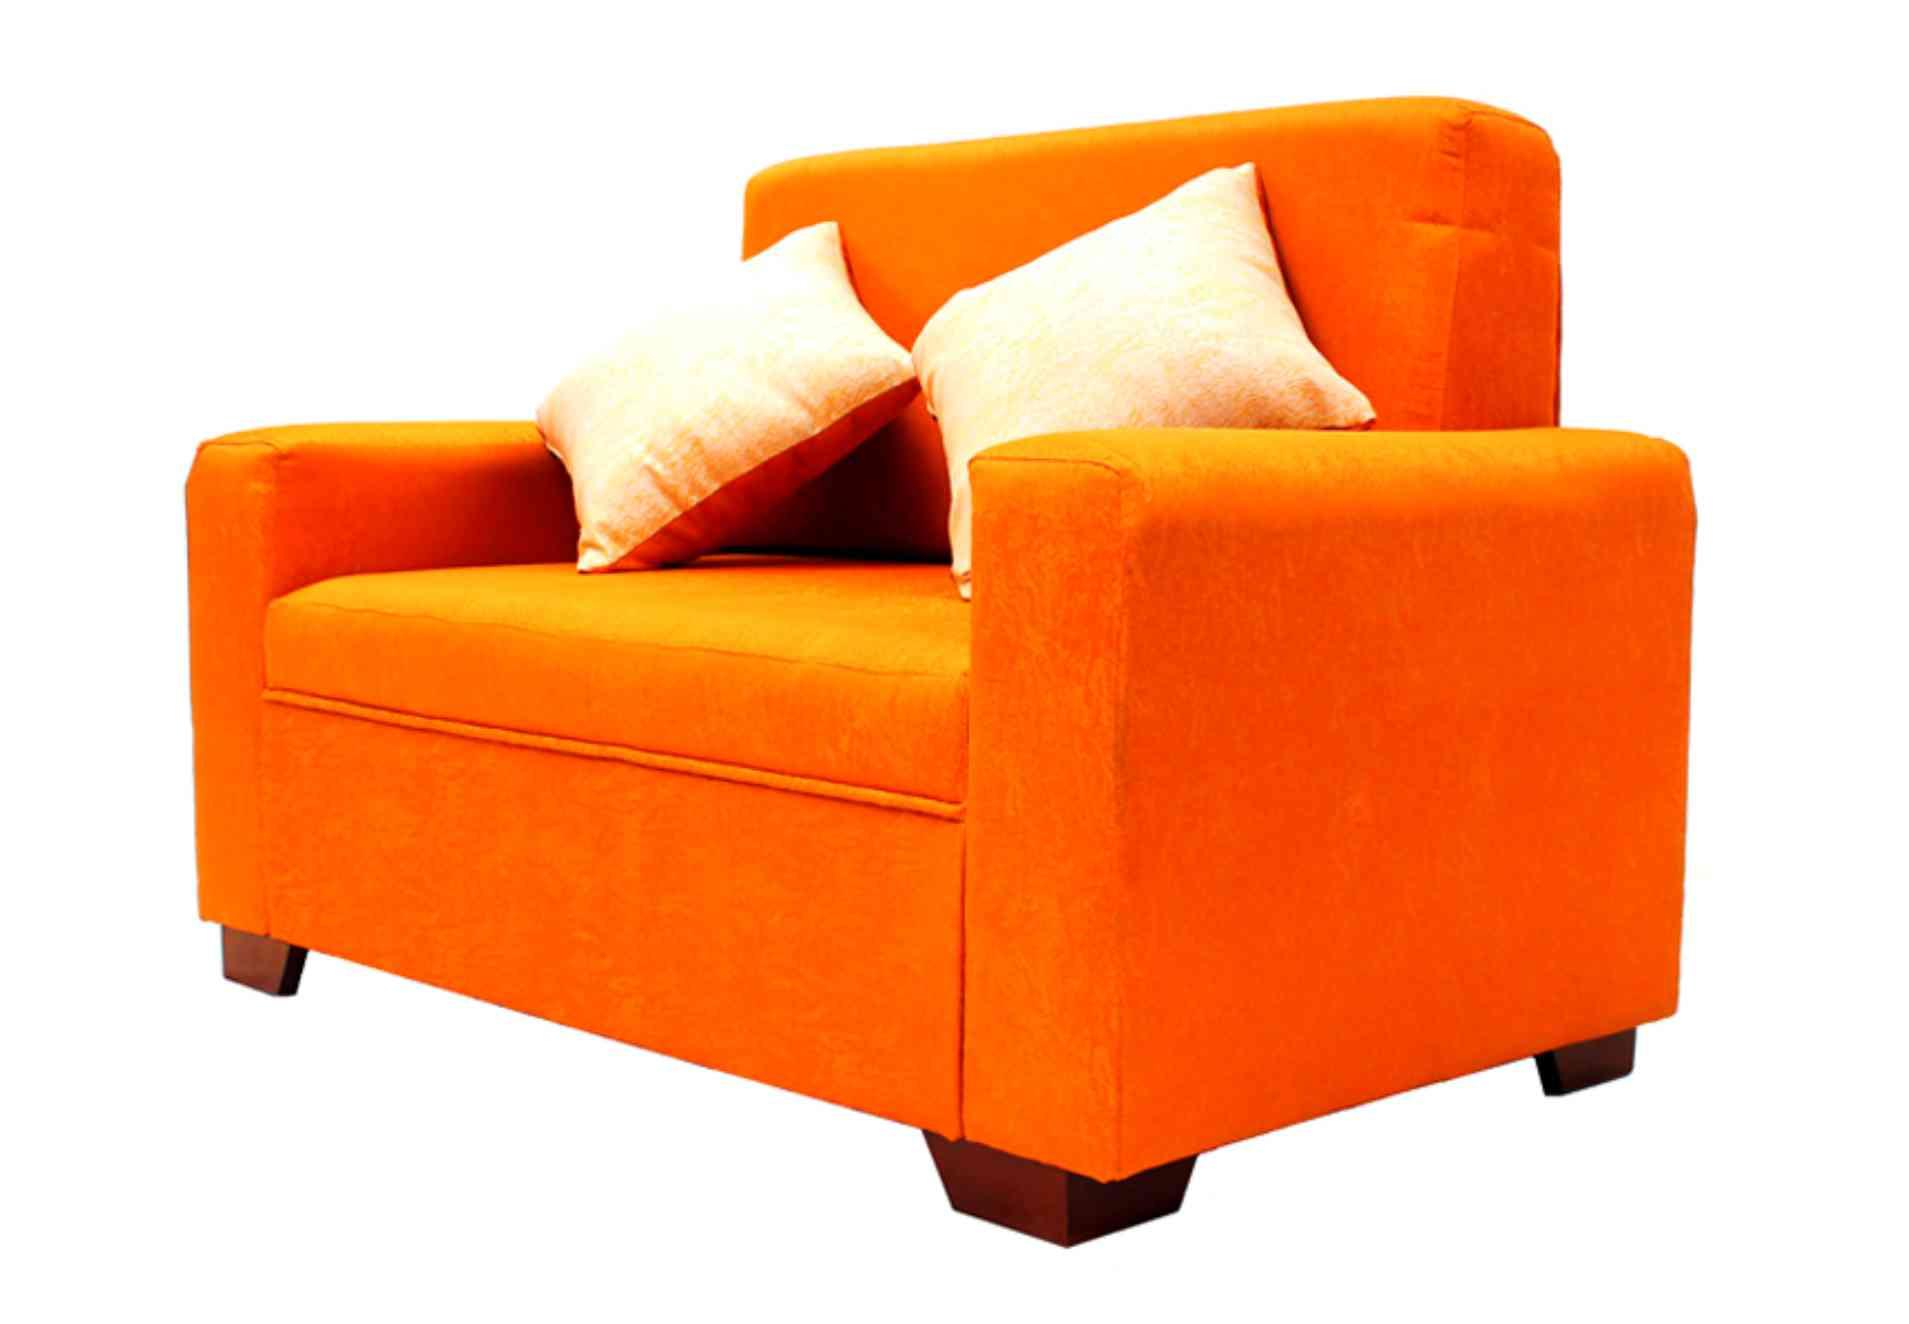 Sofa Muebles el Cid 1802